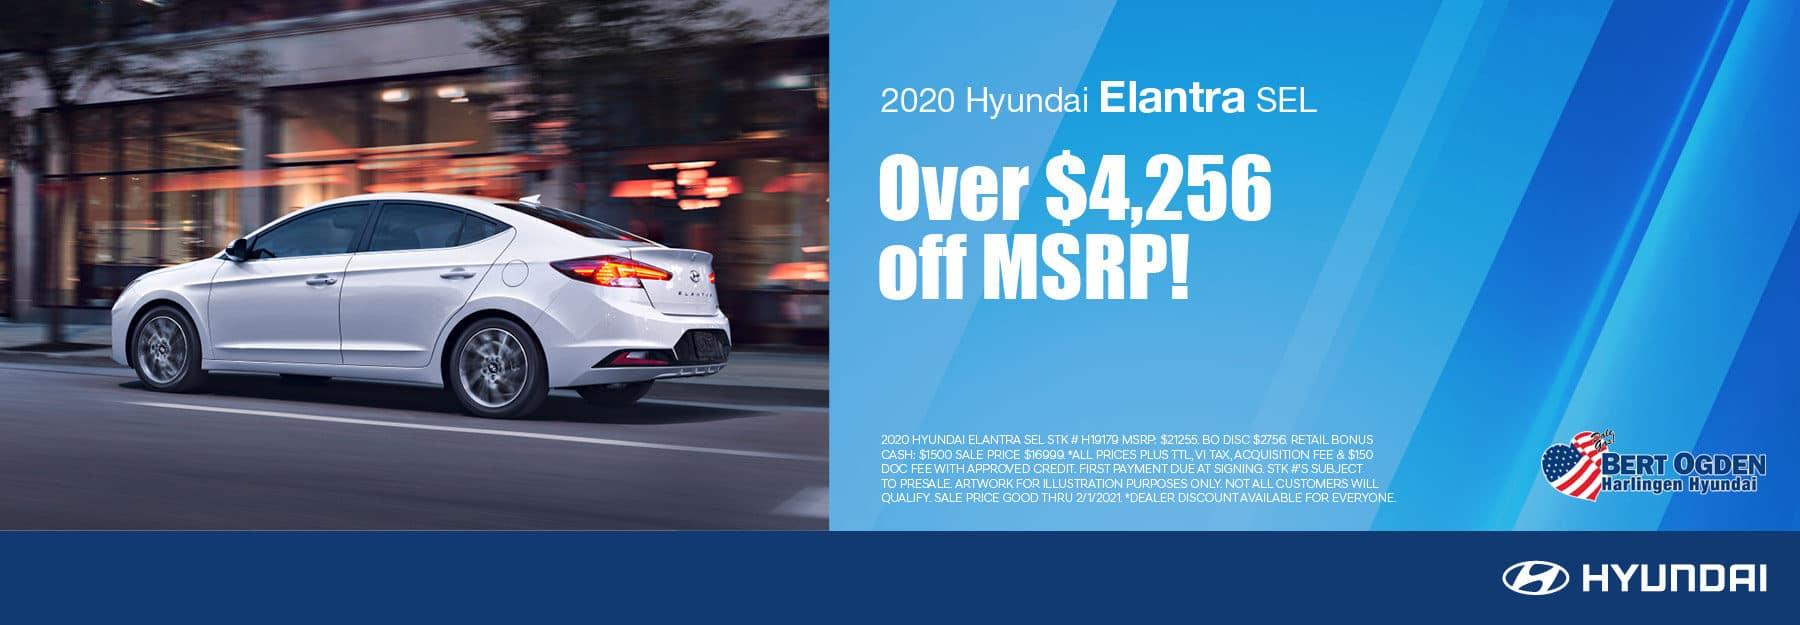 2020 Hyundai Elantra | Bert Ogden Hyundai | Harlingen, TX